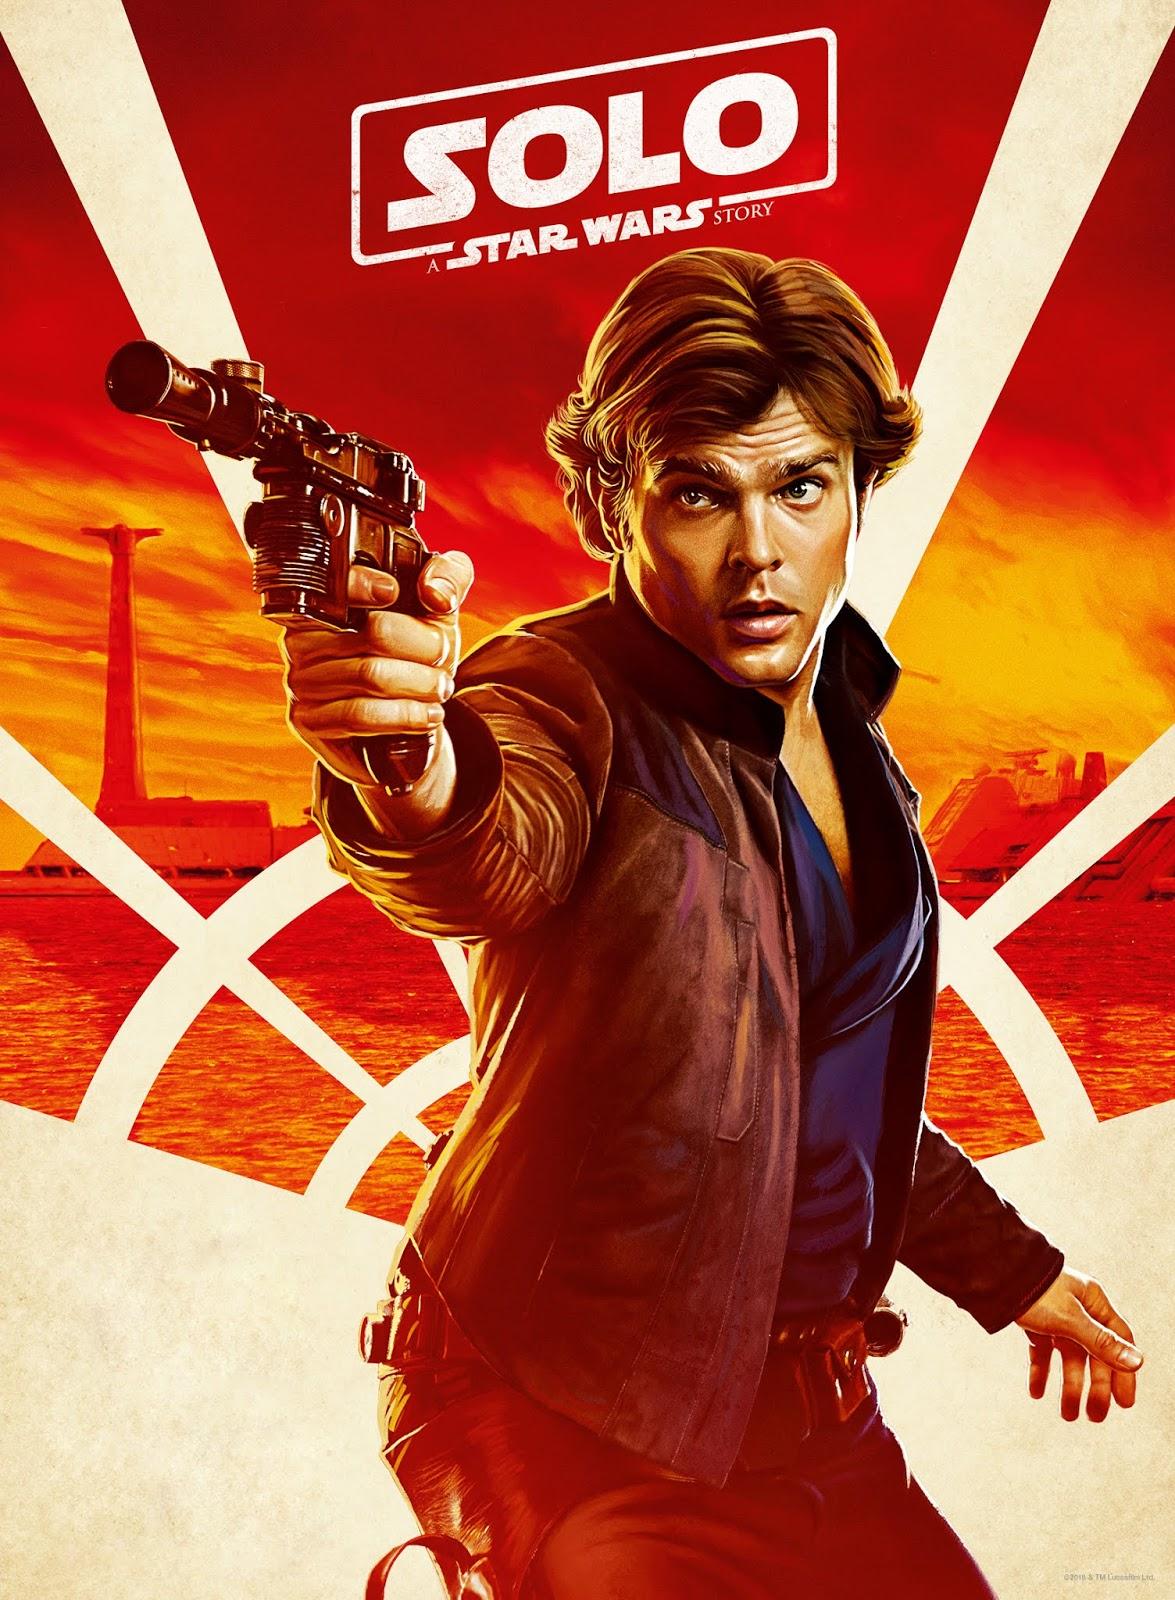 Solo: A Star Wars Story [2018] [DVD9] [PAL] [Castellano]